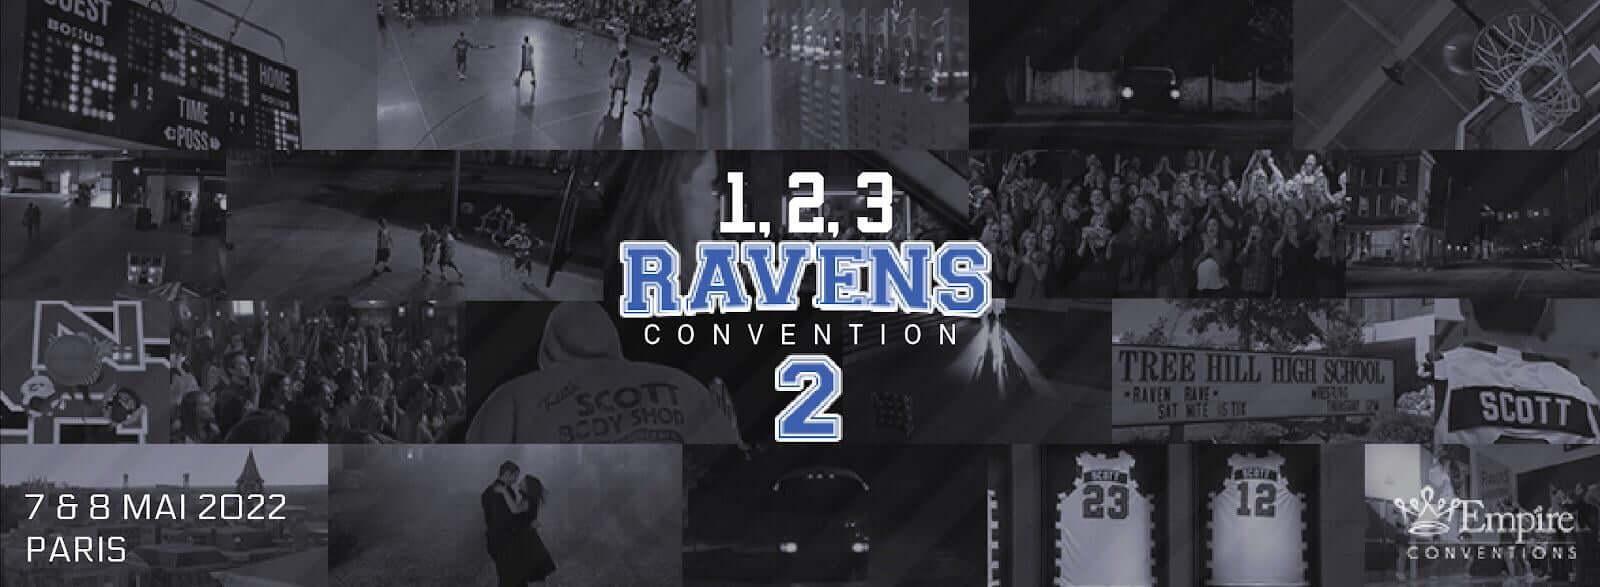 1, 2, 3 Ravens ! 2